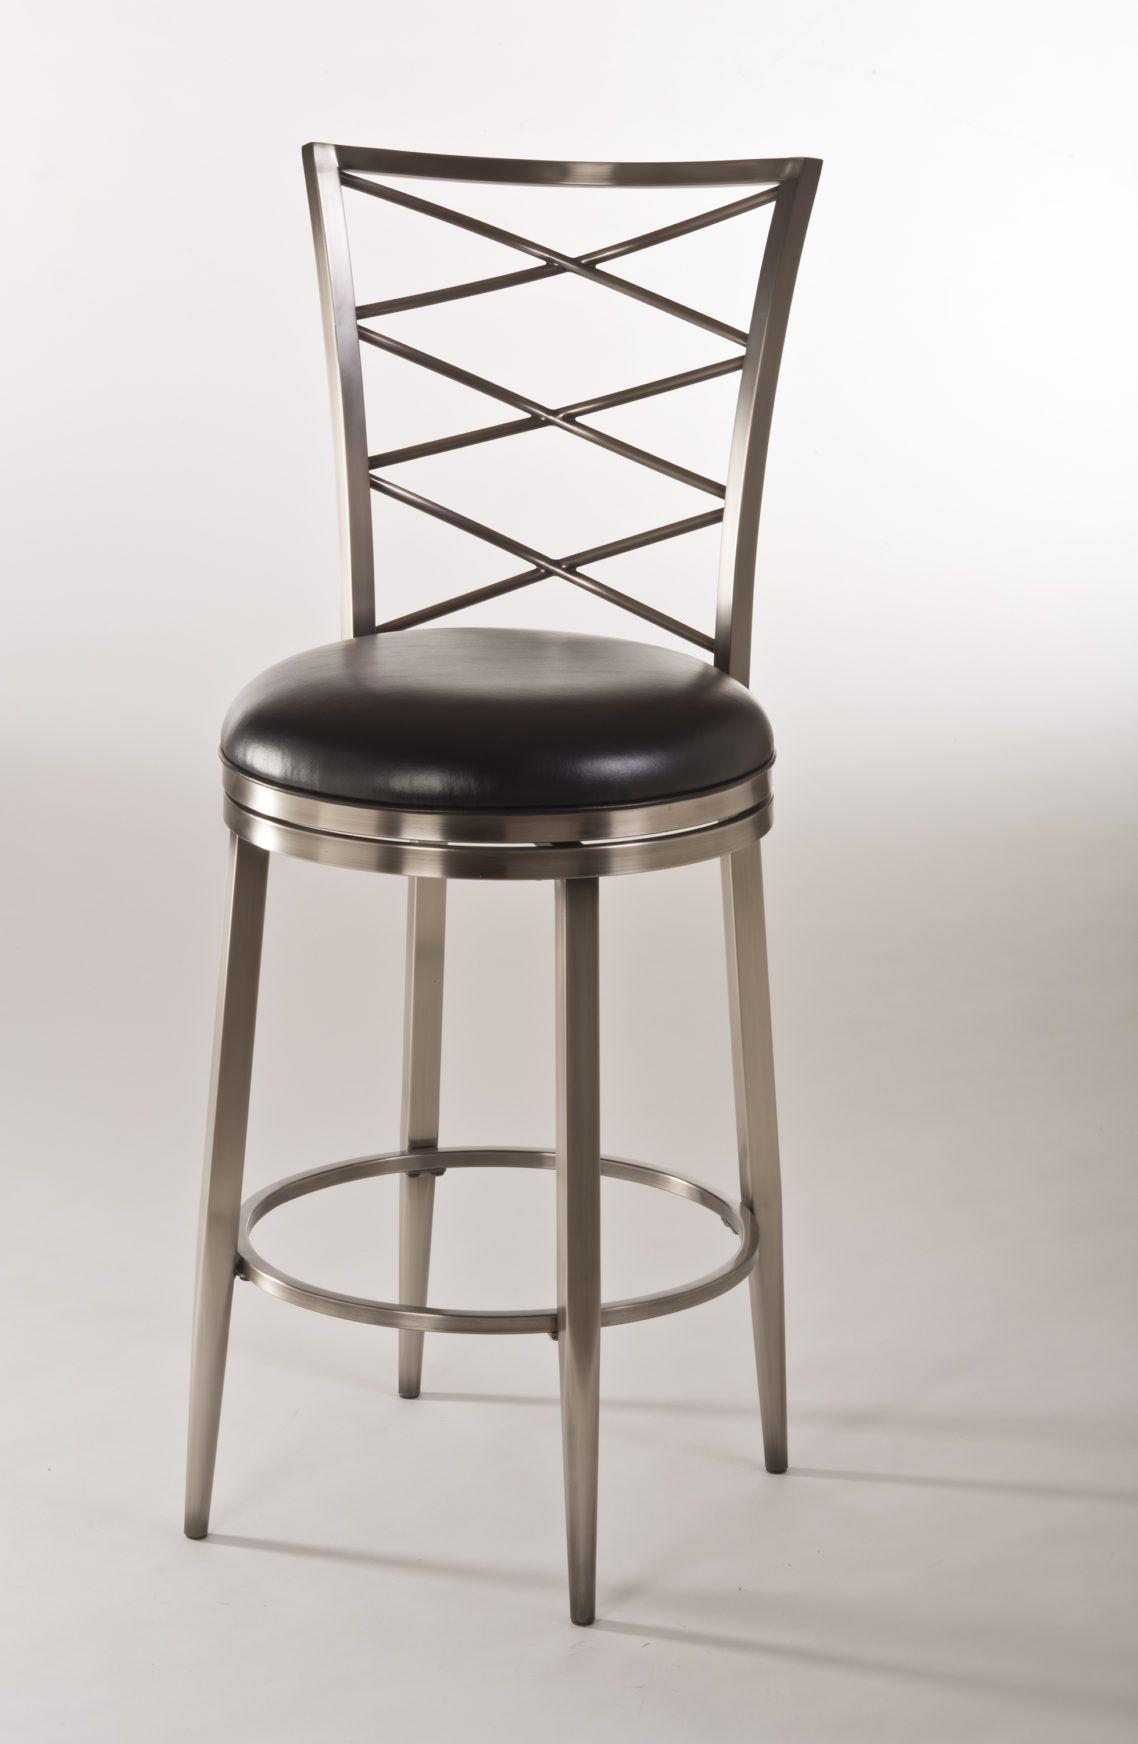 Enjoyable Agreeable Furniture Iron Bar Stool Design With Stainless Customarchery Wood Chair Design Ideas Customarcherynet